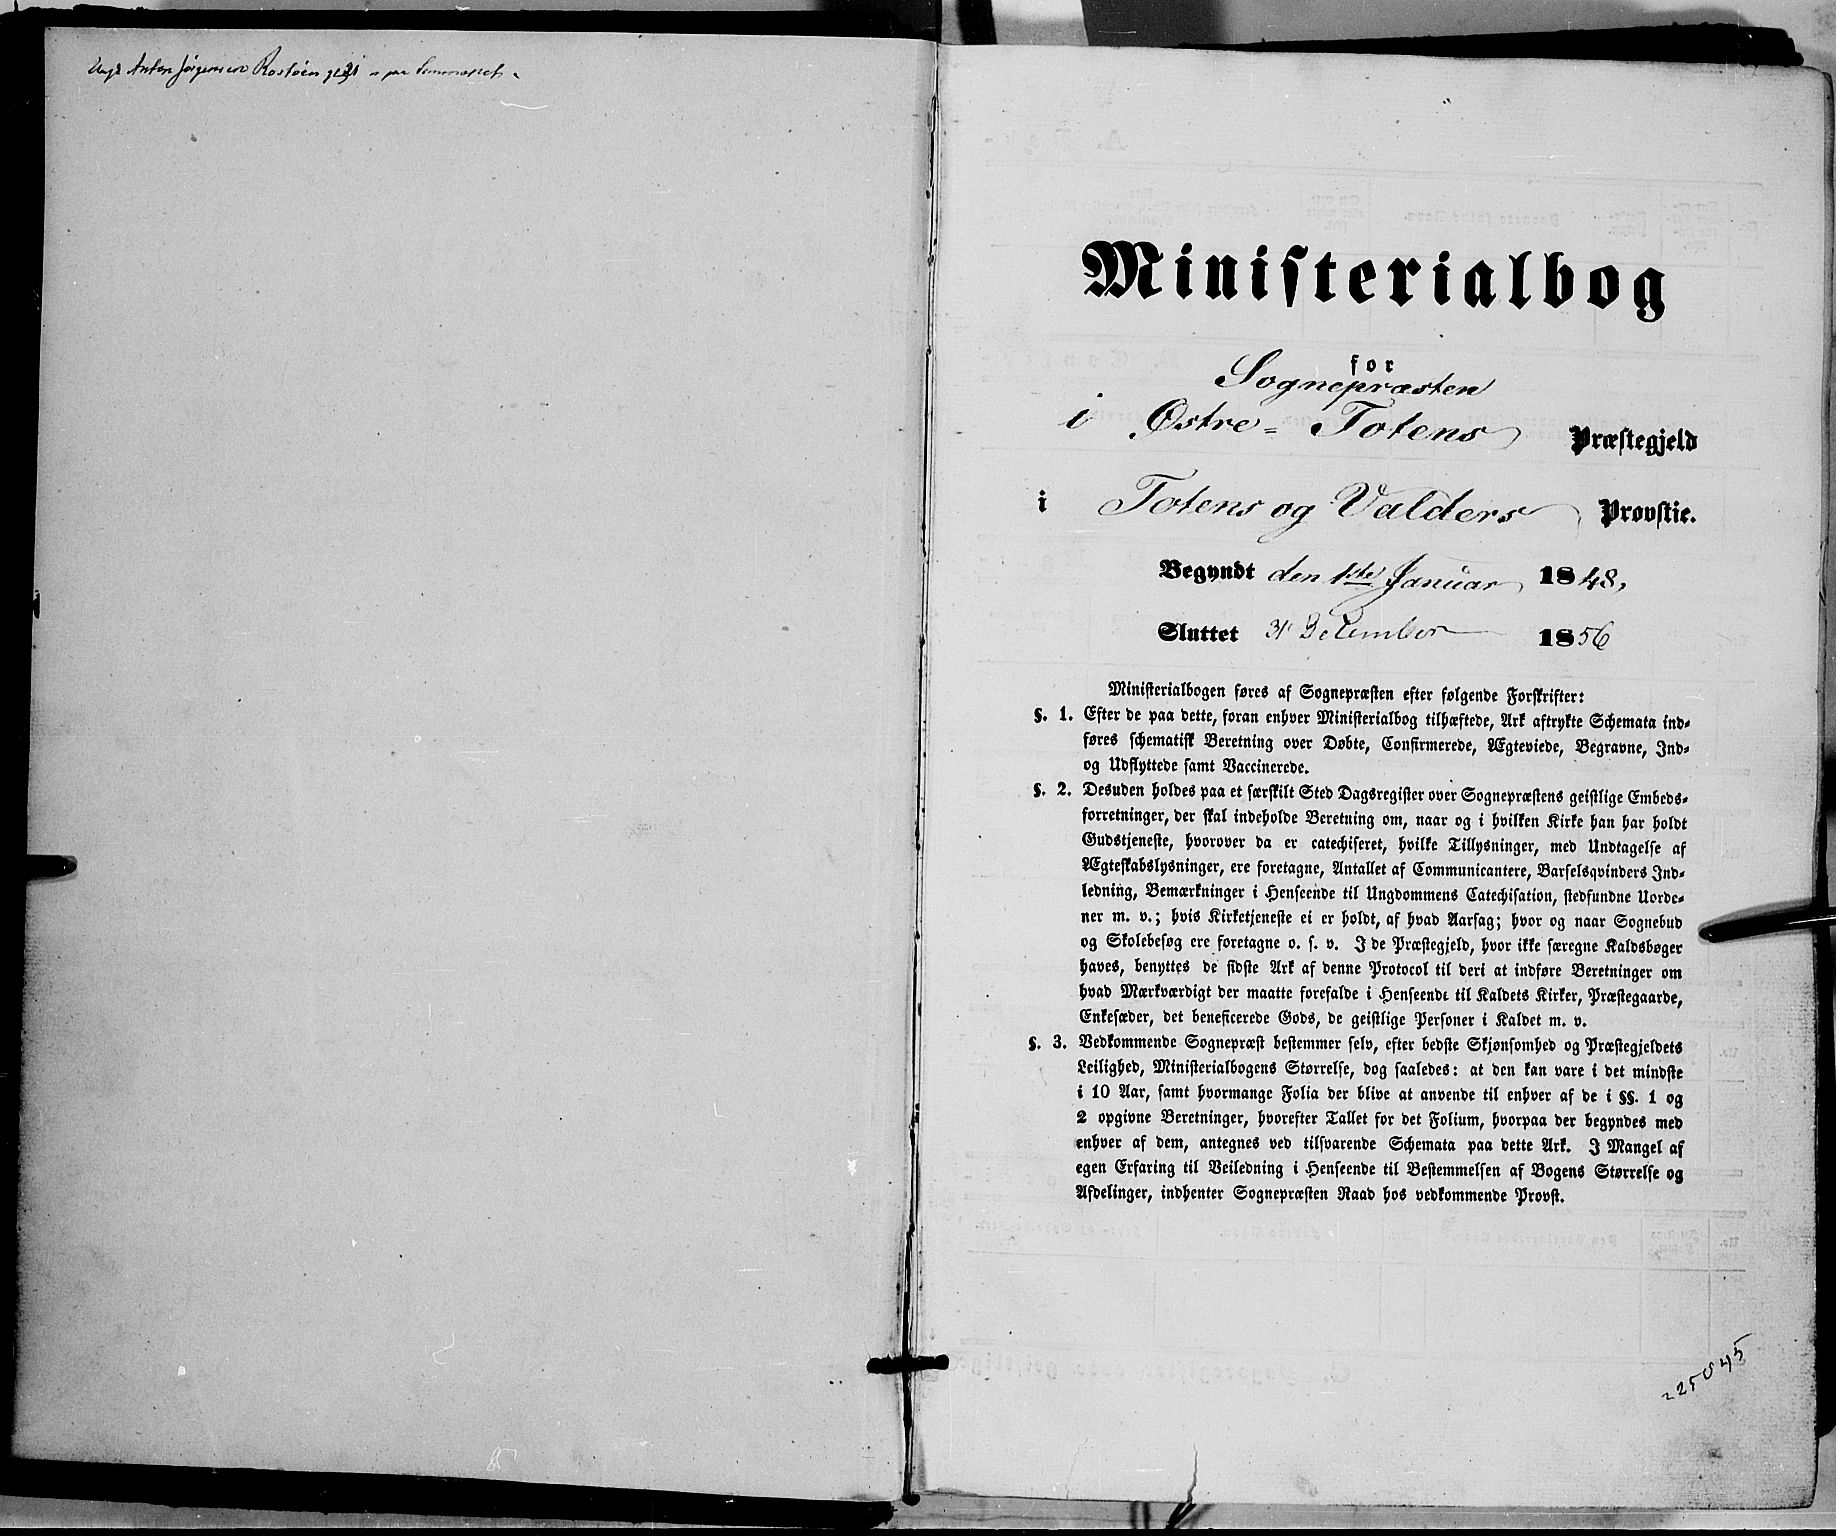 SAH, Østre Toten prestekontor, Ministerialbok nr. 3, 1848-1856